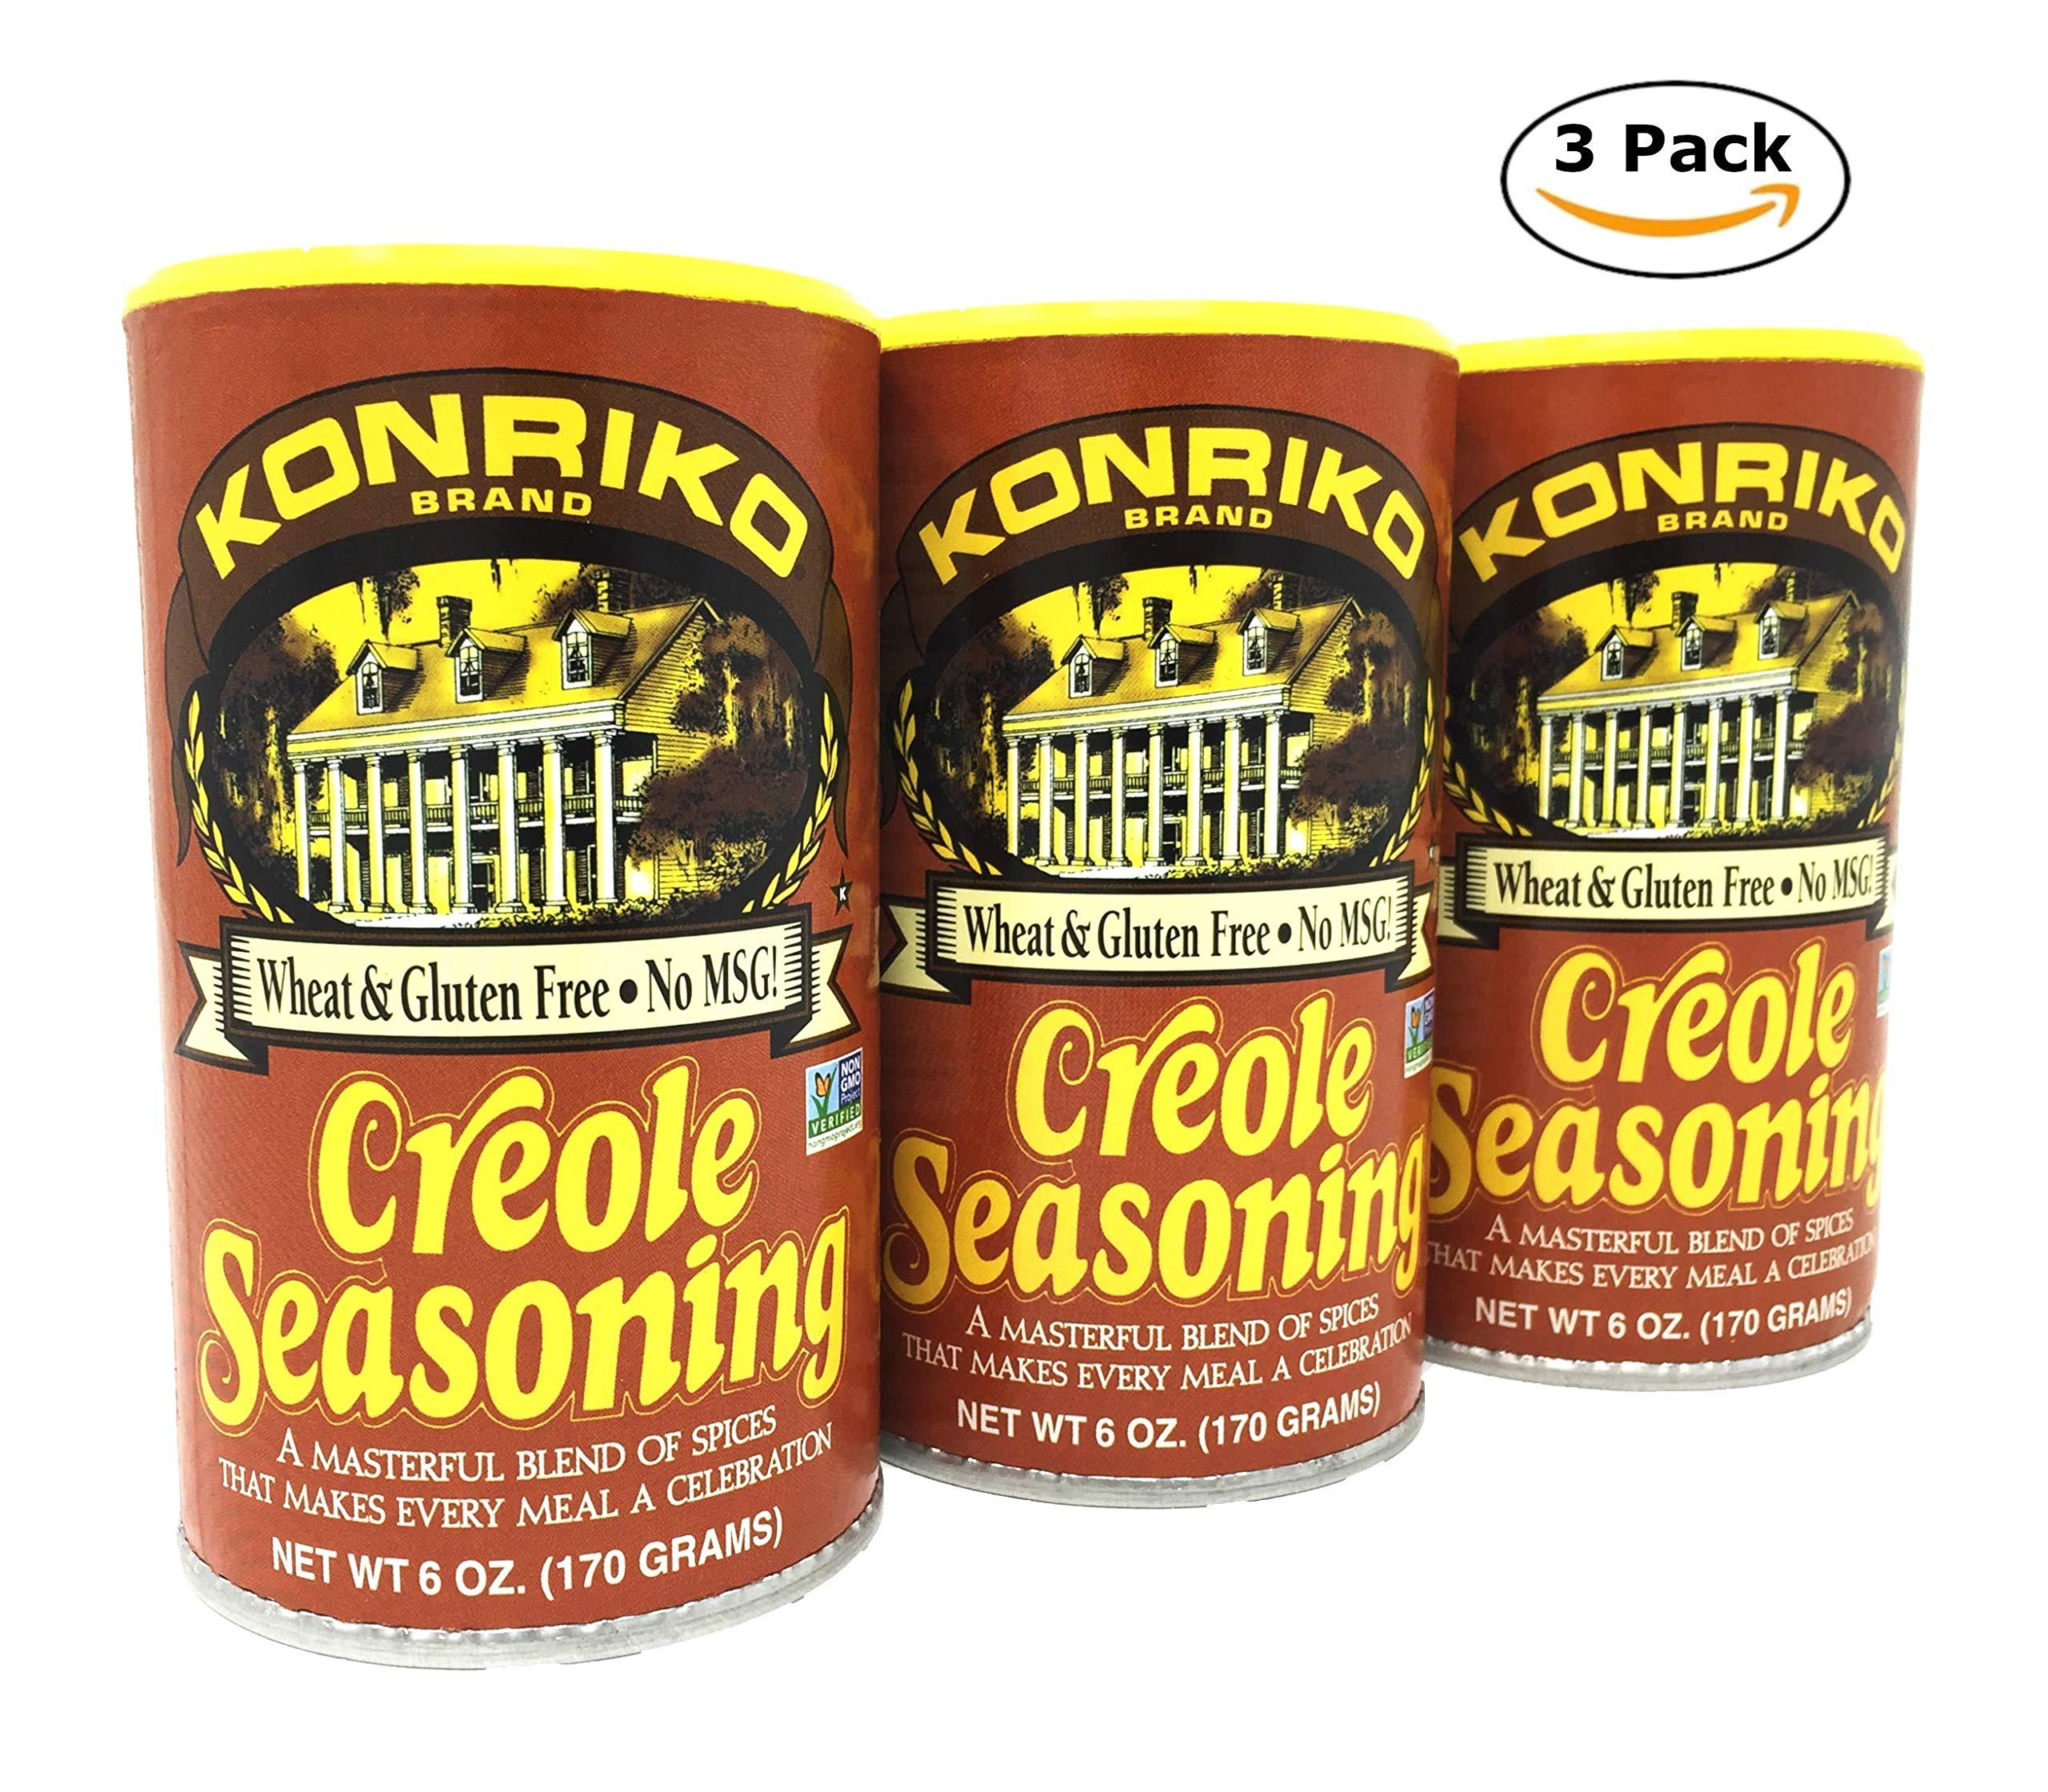 Konriko Creole Seasoning 6oz Canister (Pack of 3)